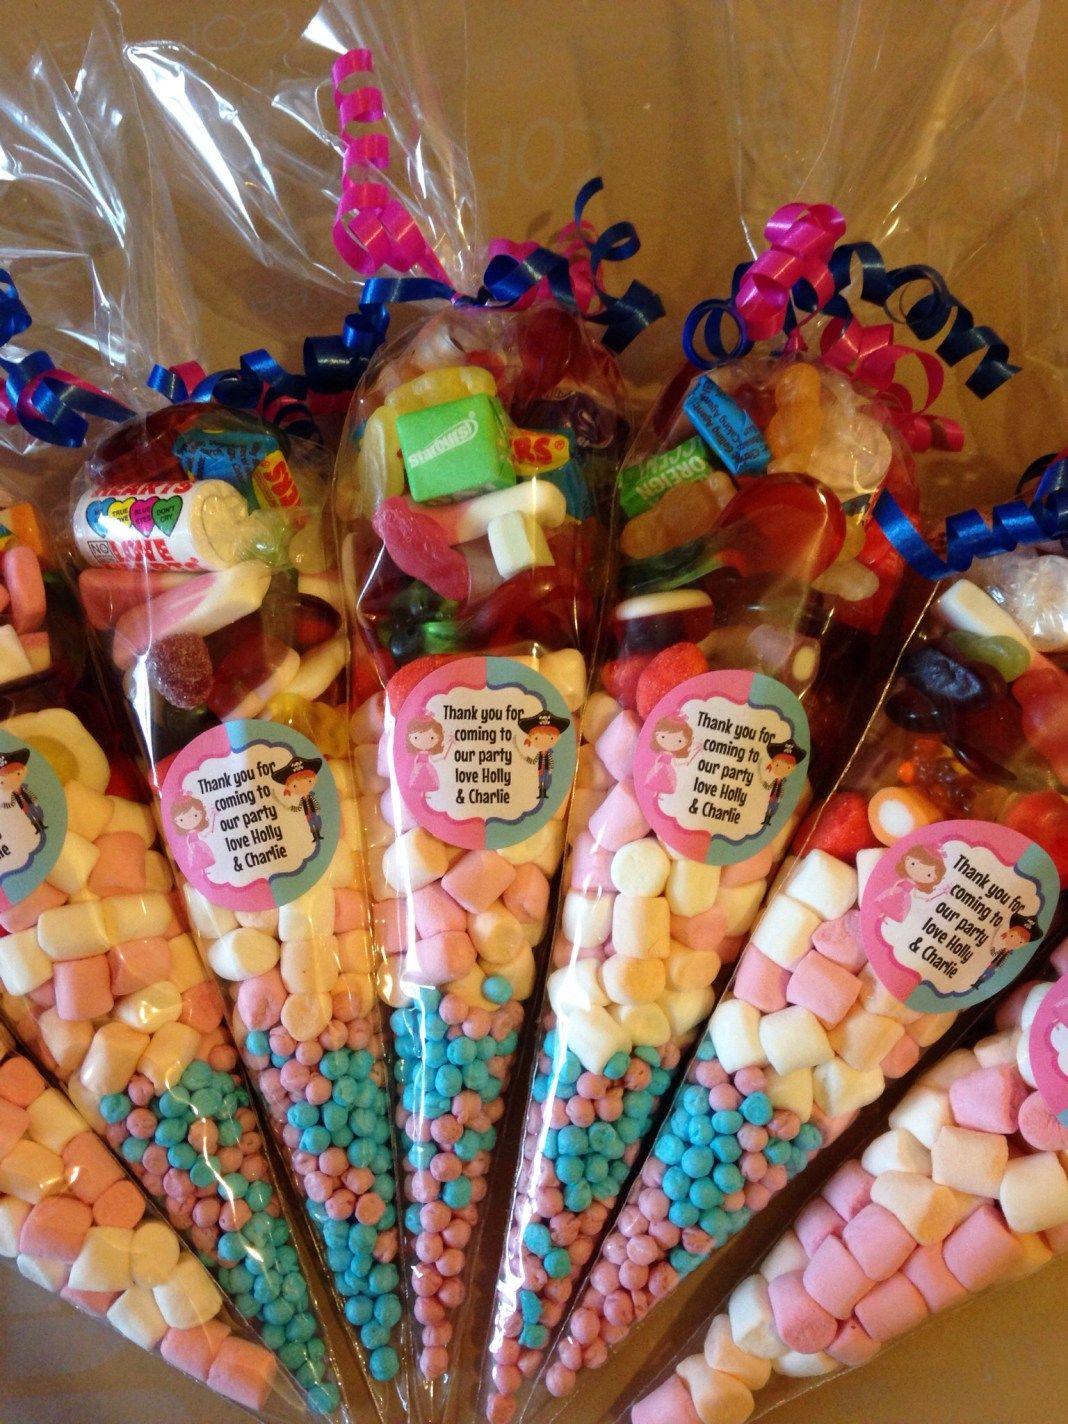 Obsequios dulces en bolsas de cono cumple candy - Golosinas para cumpleanos de ninos ...